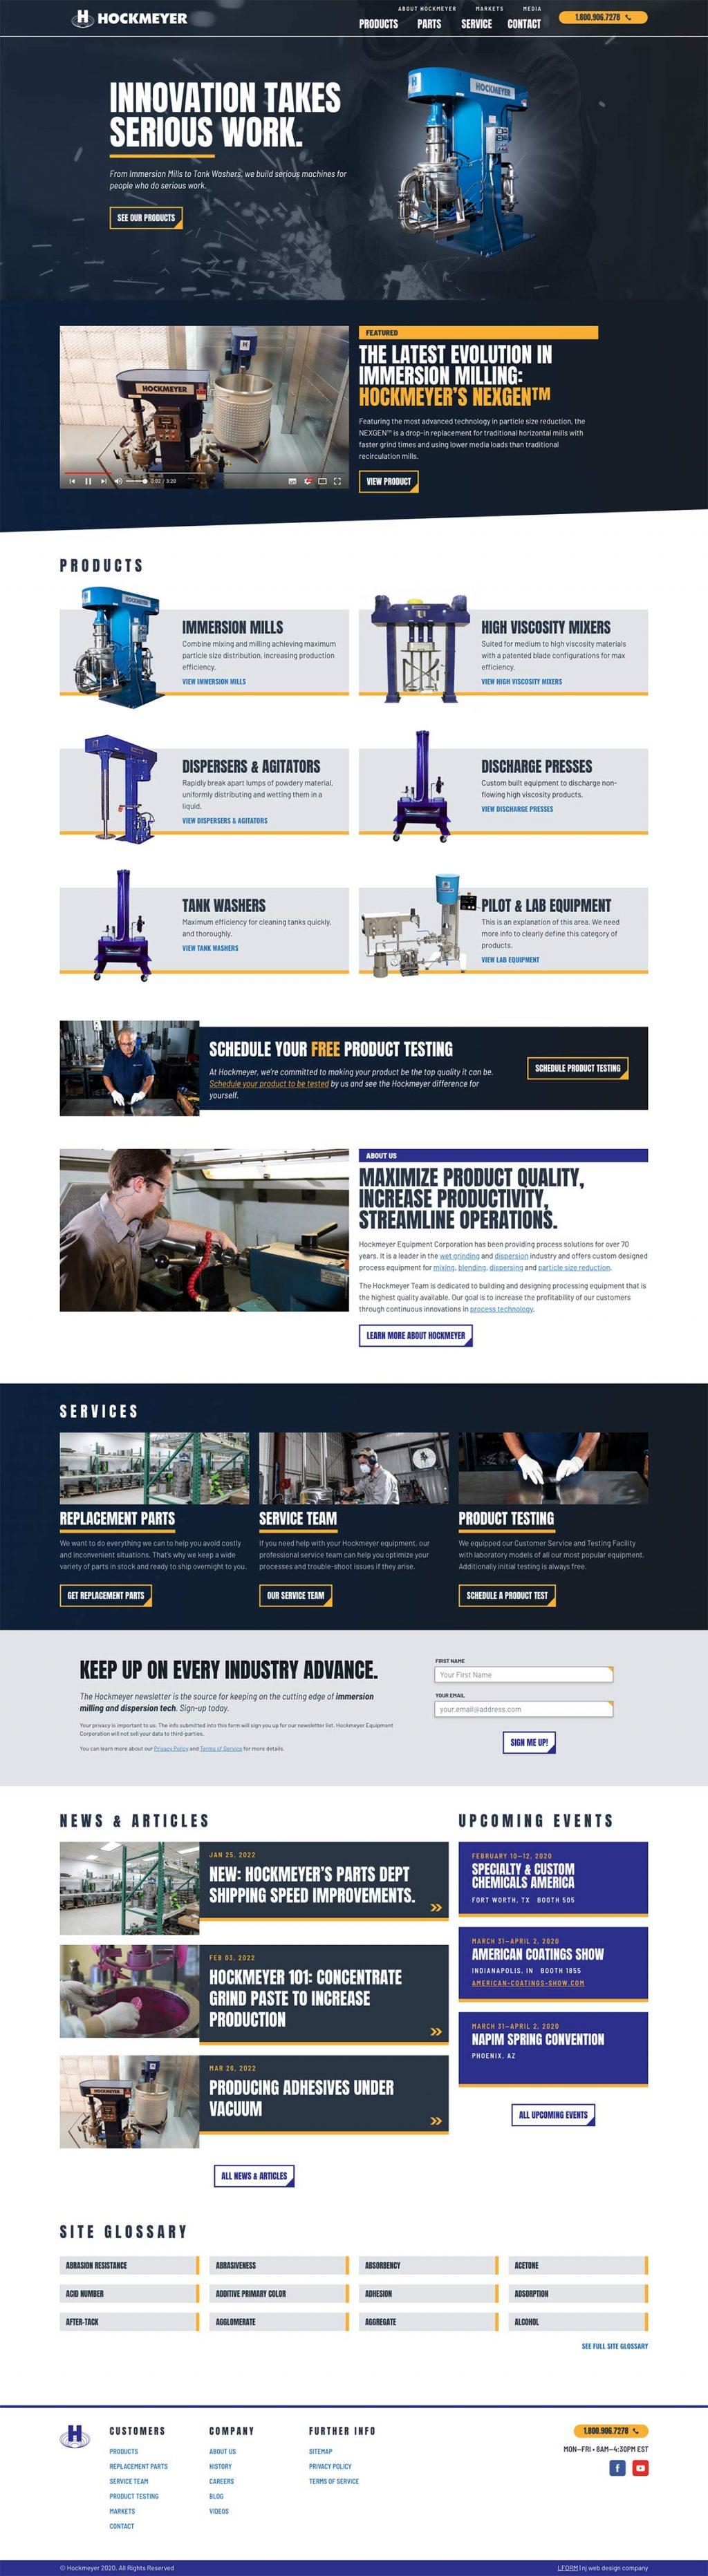 Homepage of Hockmeyer Equipment Corporation